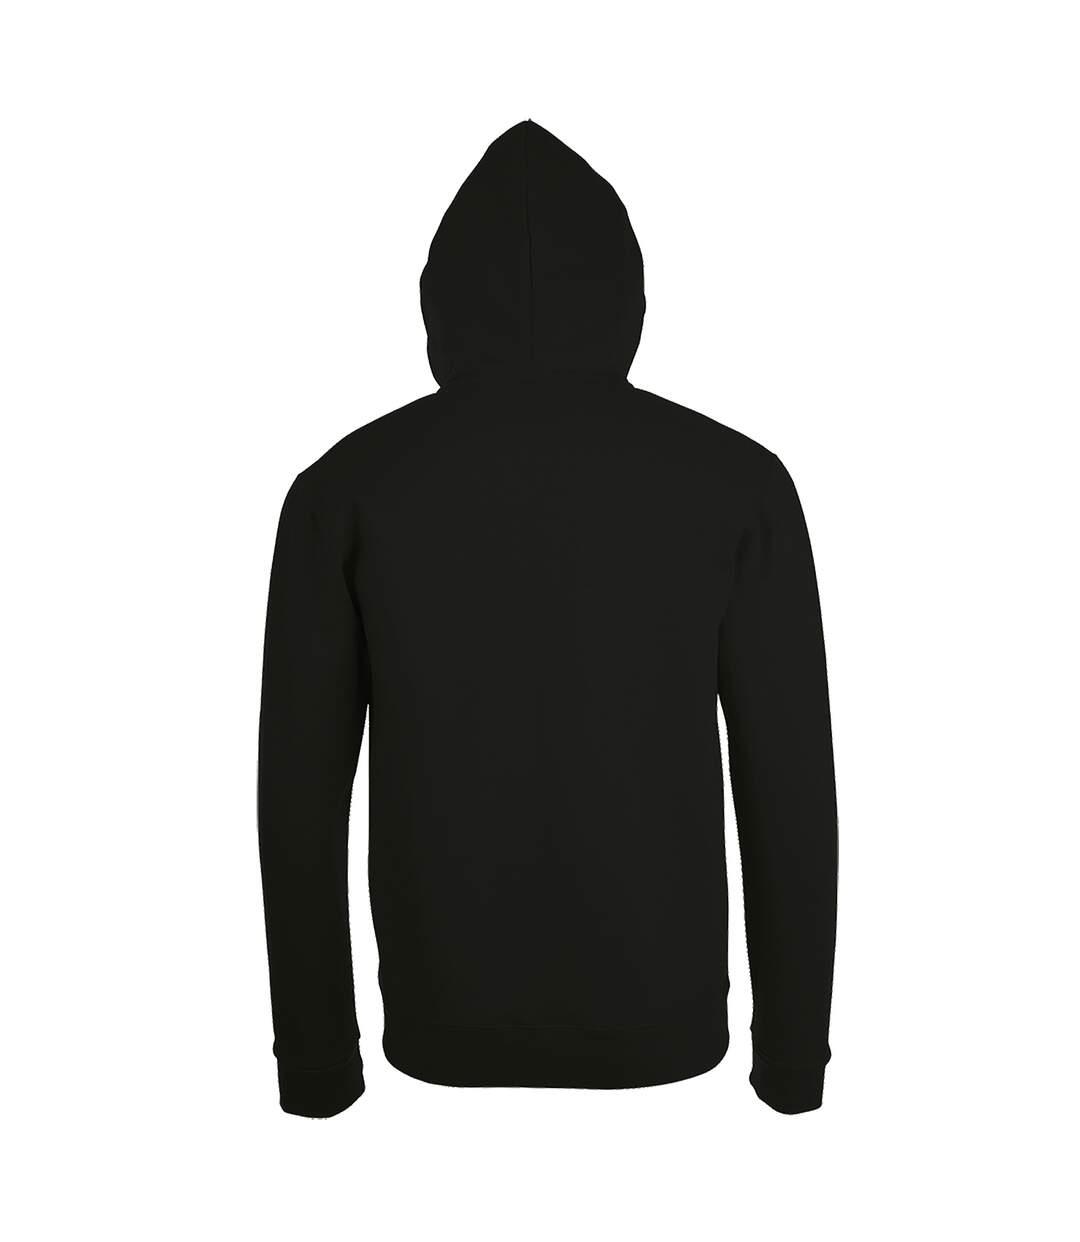 SOLS - Sweat à capuche et fermeture zippée - Homme (Bleu marine) - UTPC2784